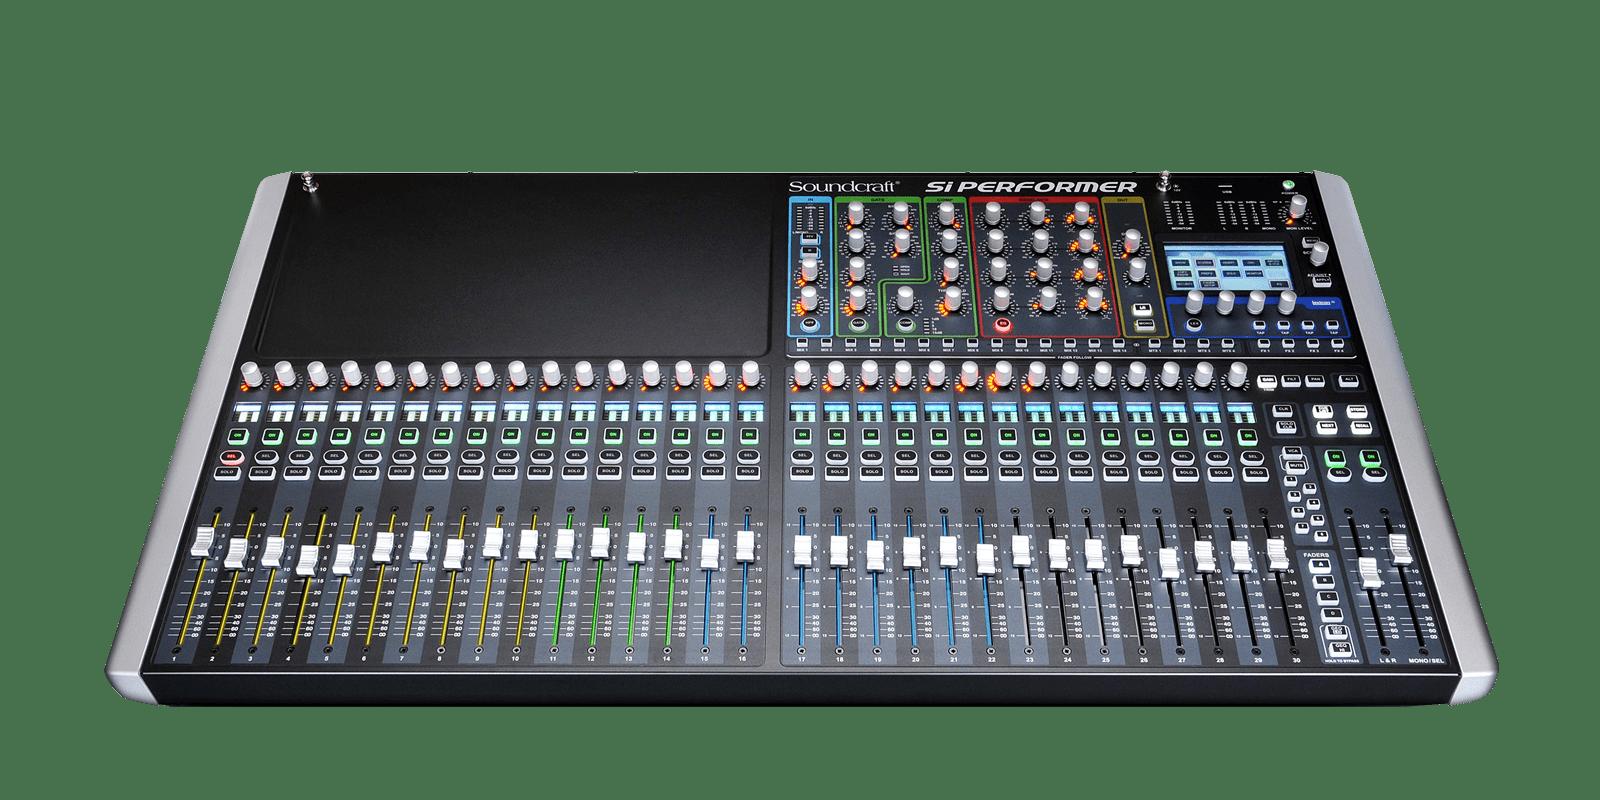 soundcraft si performer 3 digital live sound mixer b stock 5001849 b. Black Bedroom Furniture Sets. Home Design Ideas